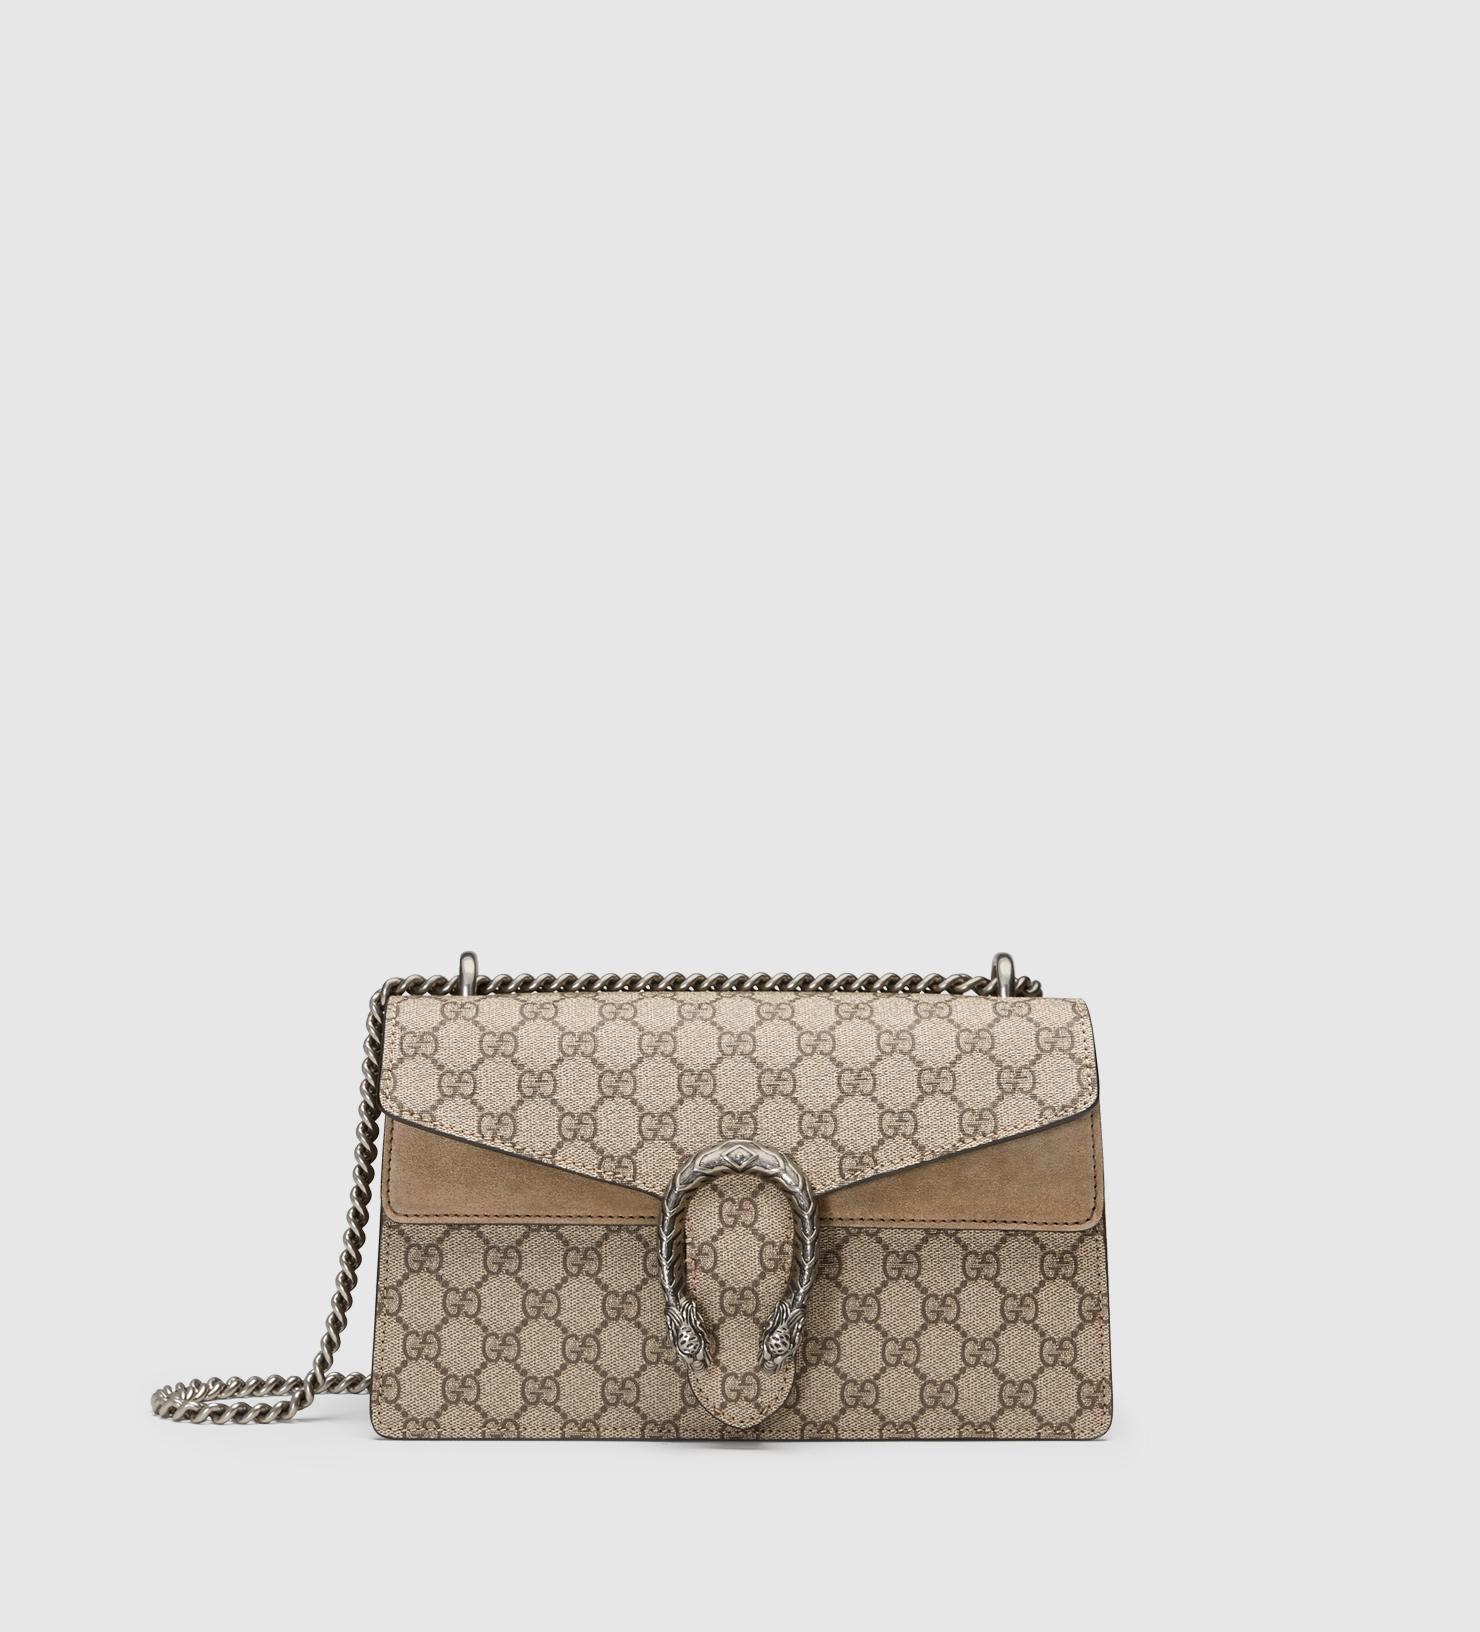 d9e44a1a63e9 Gucci Dionysus Gg Supreme Shoulder Bag   Stanford Center for ...